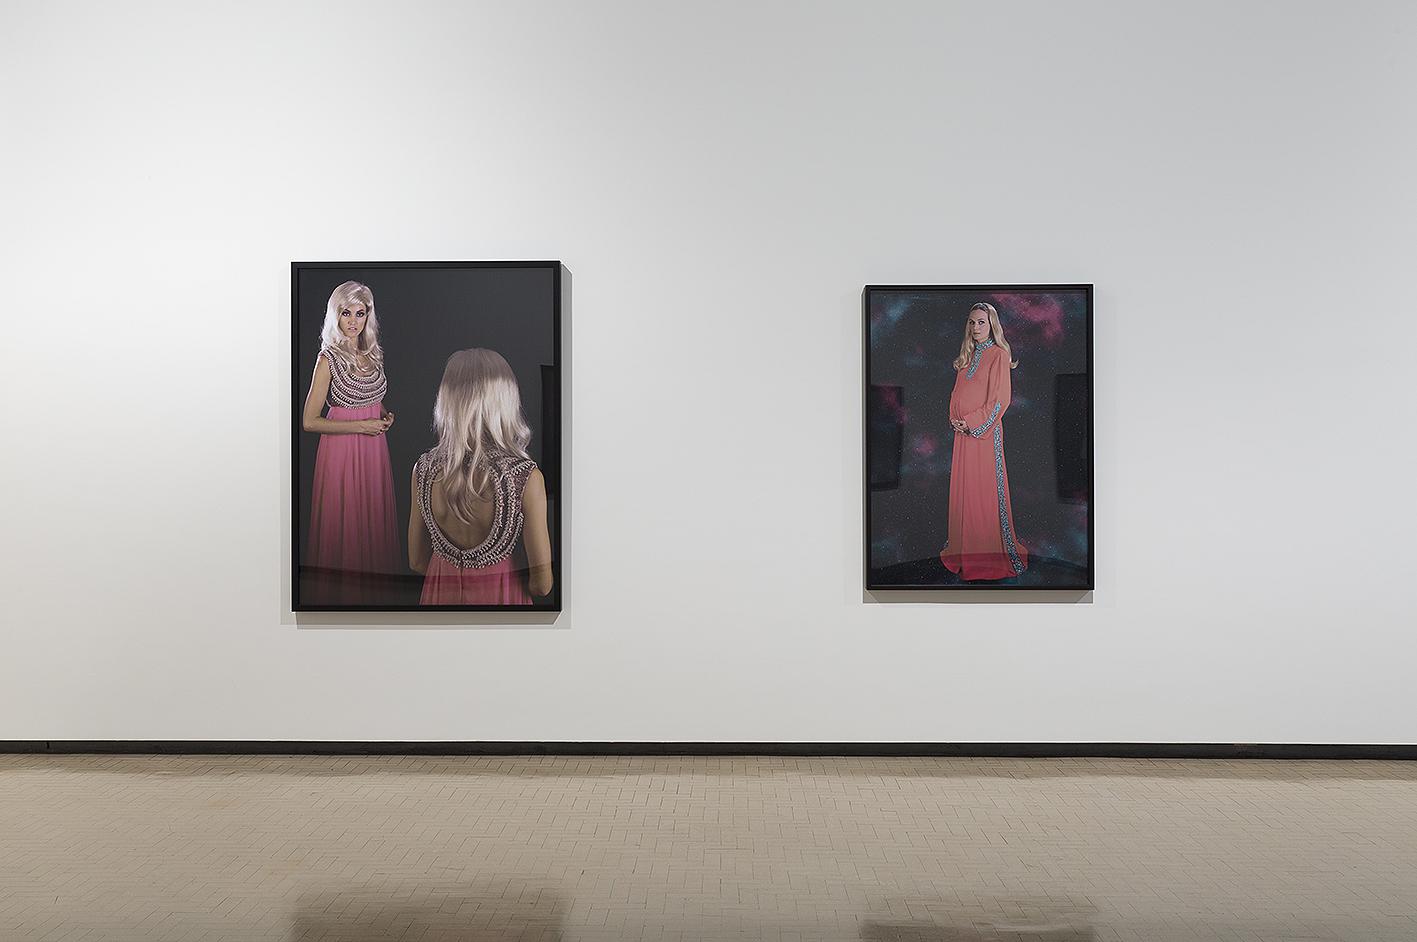 City Gallery_Yvonne Todd_Creamy Psychology_documentation_hiRez_021.jpg